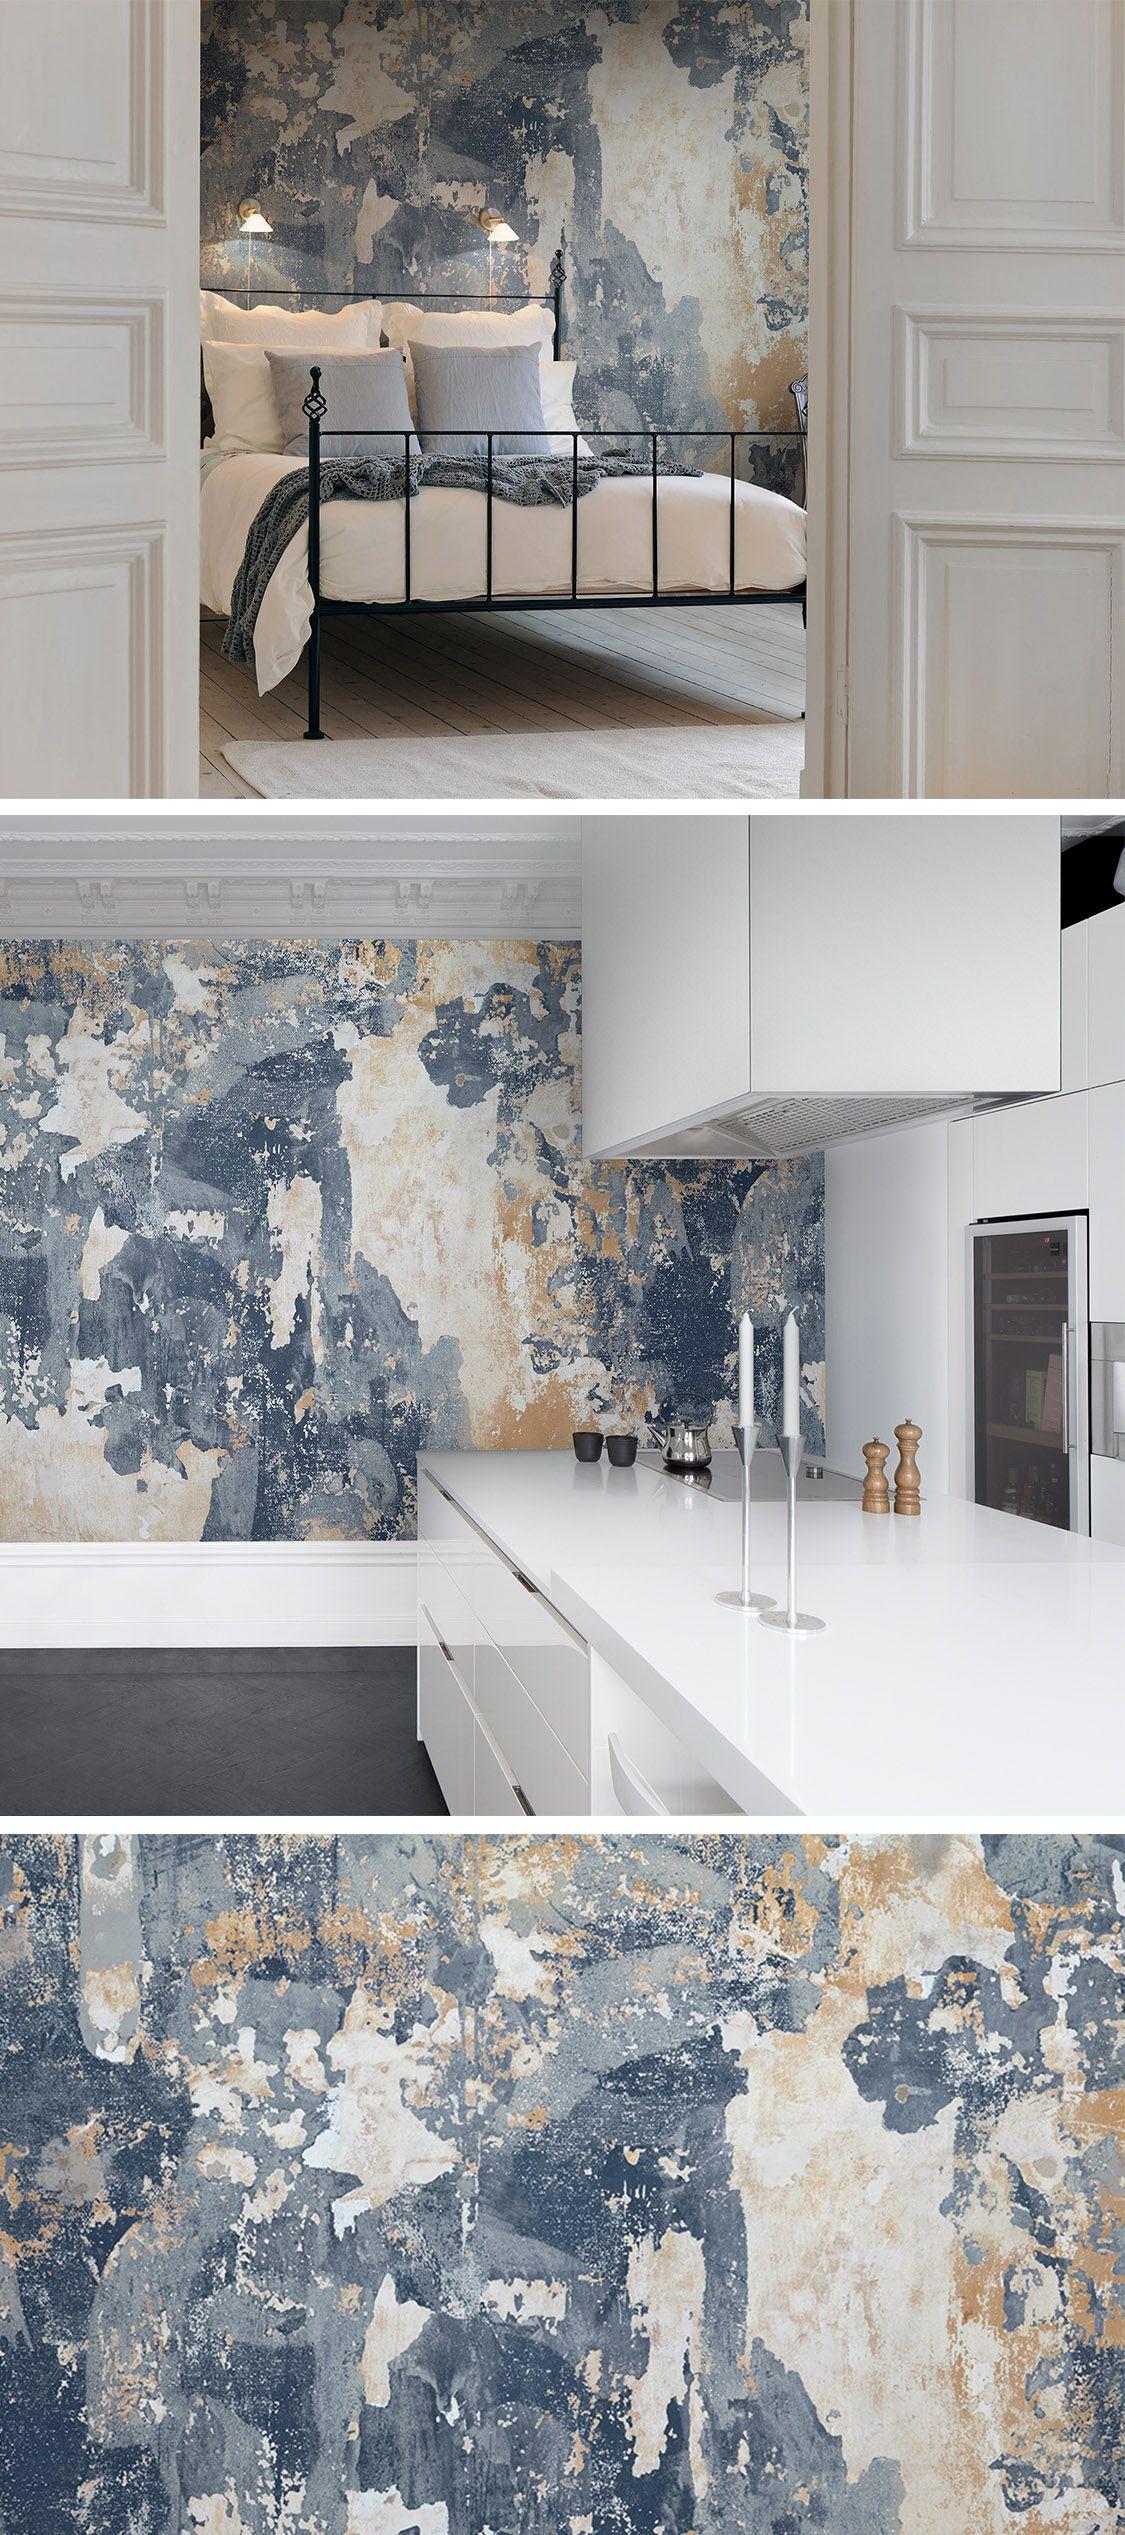 Battered Wall Wandgestaltung Tapete Moderne Tapeten Und Backstein Tapete